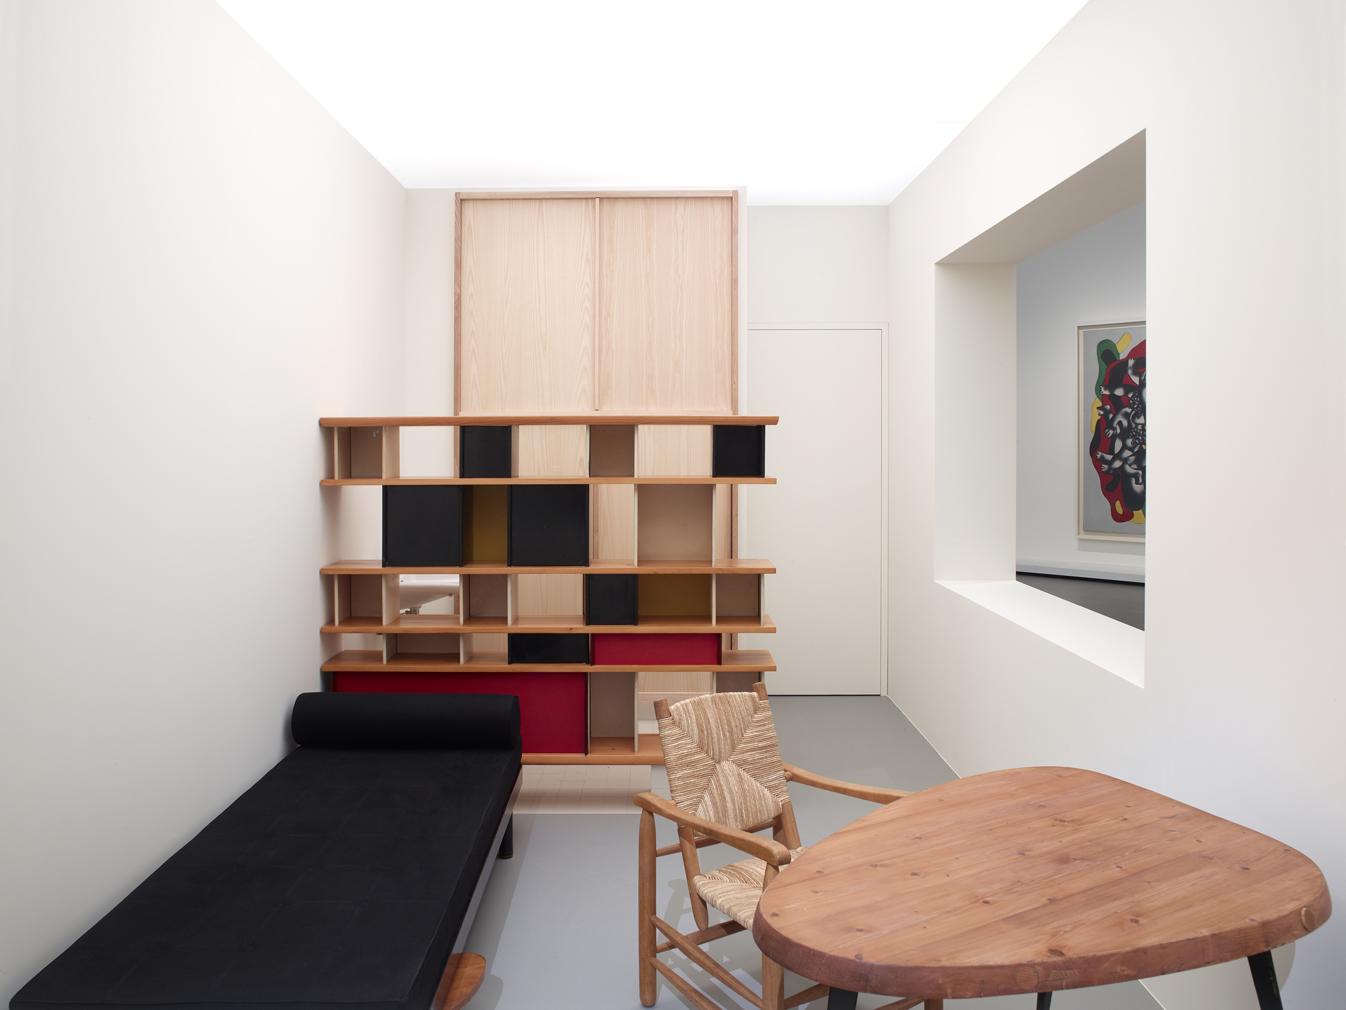 Architecte D Intérieur Paris 8 discover charlotte perriand's world in five rooms - the spaces